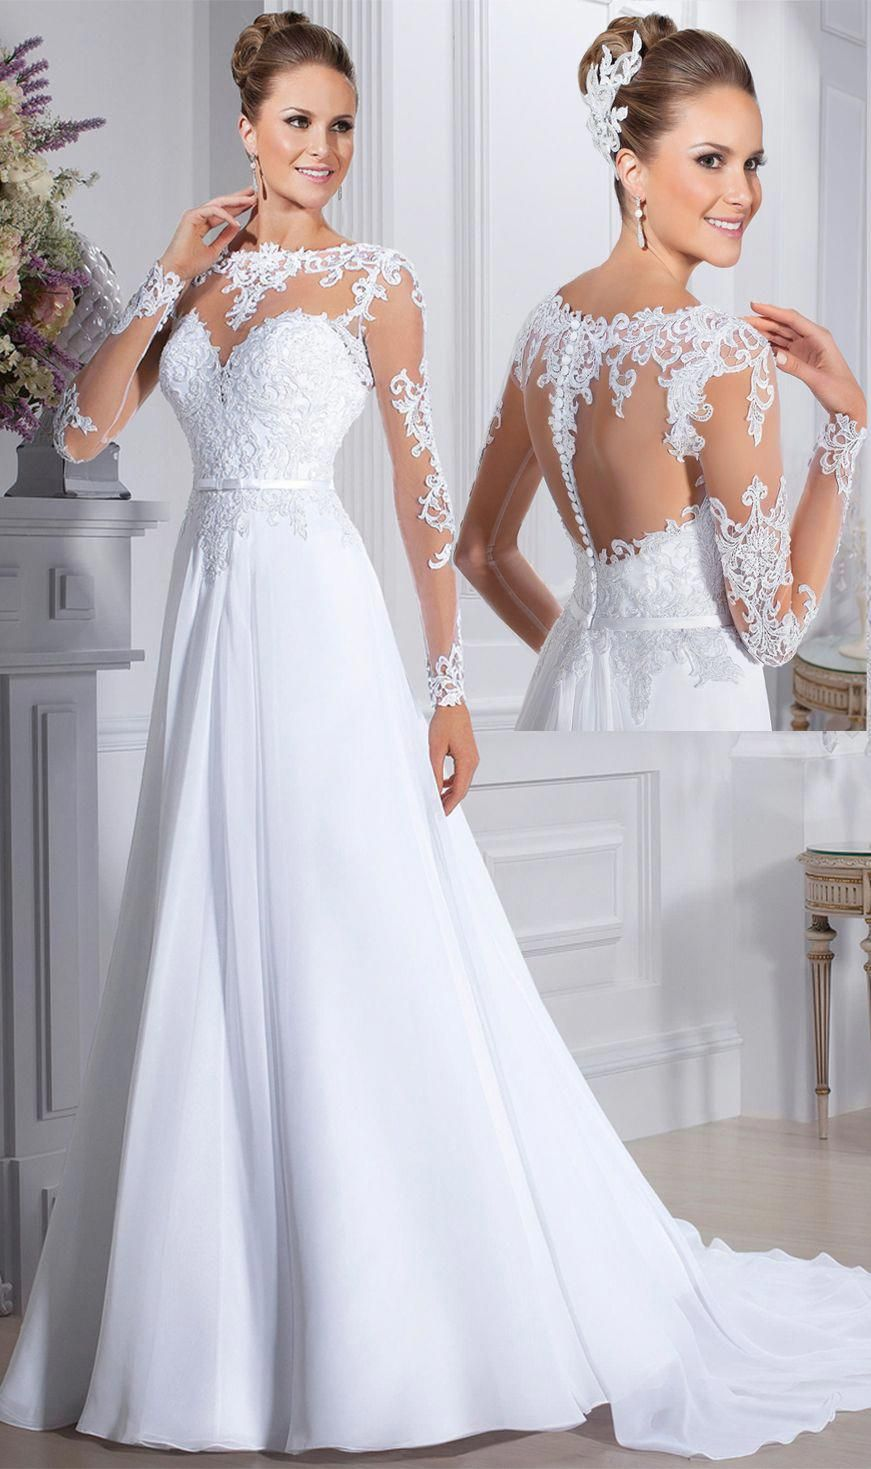 2018 A Line Scoop Wedding Dresses Long Sleeves Chiffon